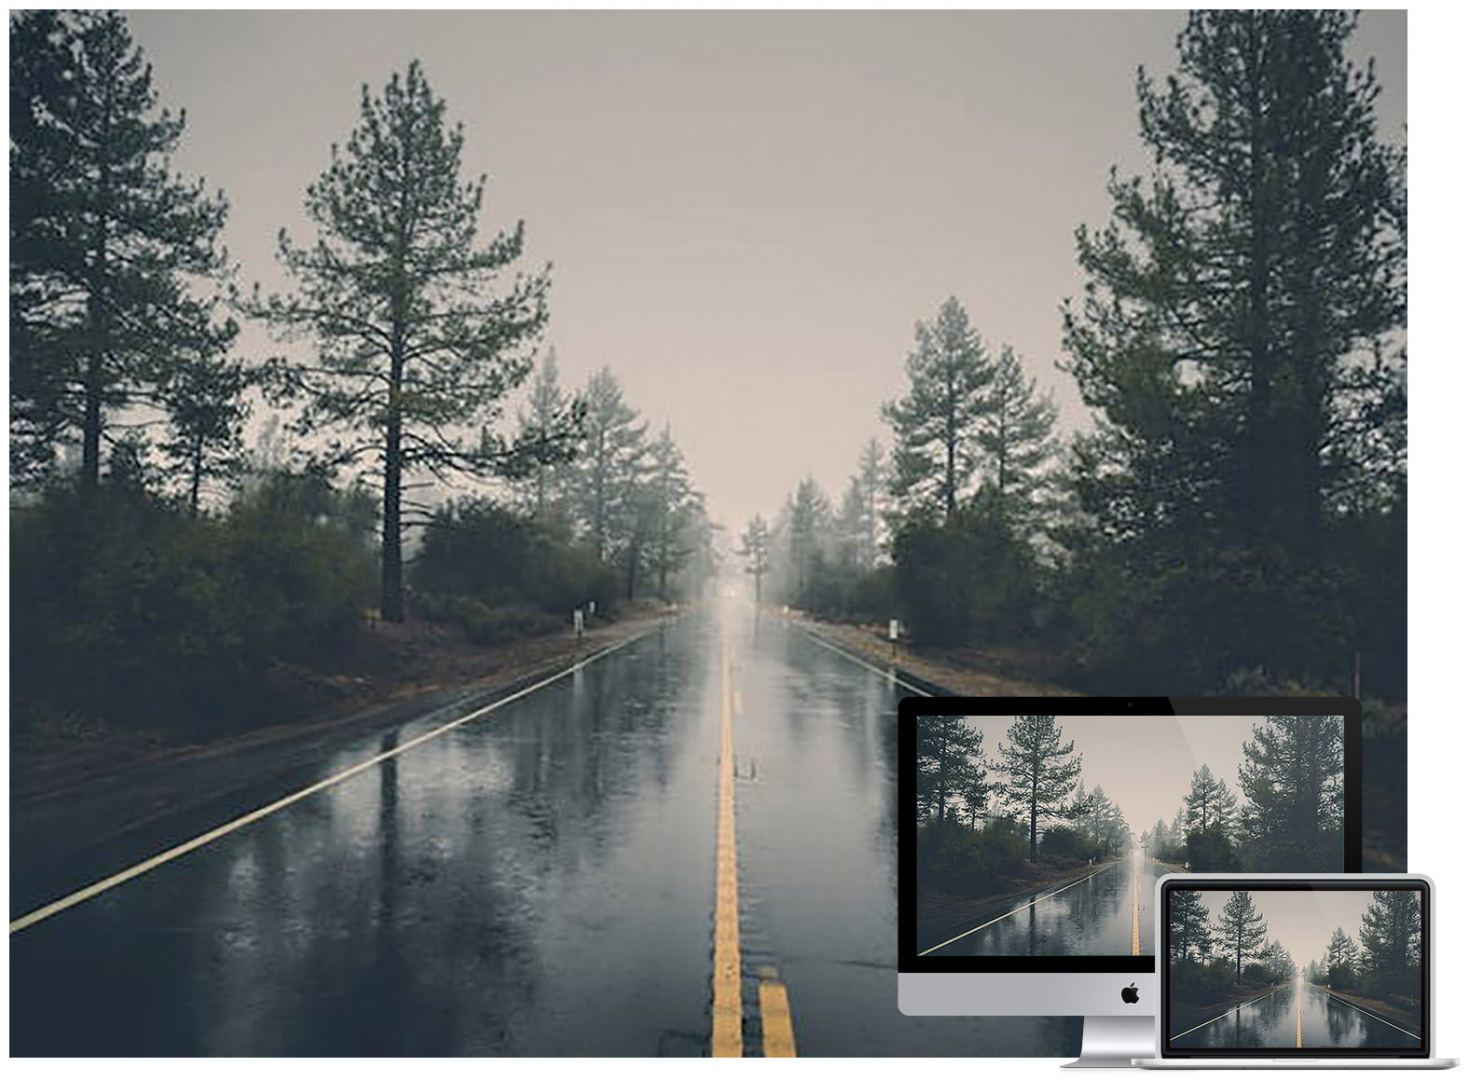 wet-road-forest-wallpaper